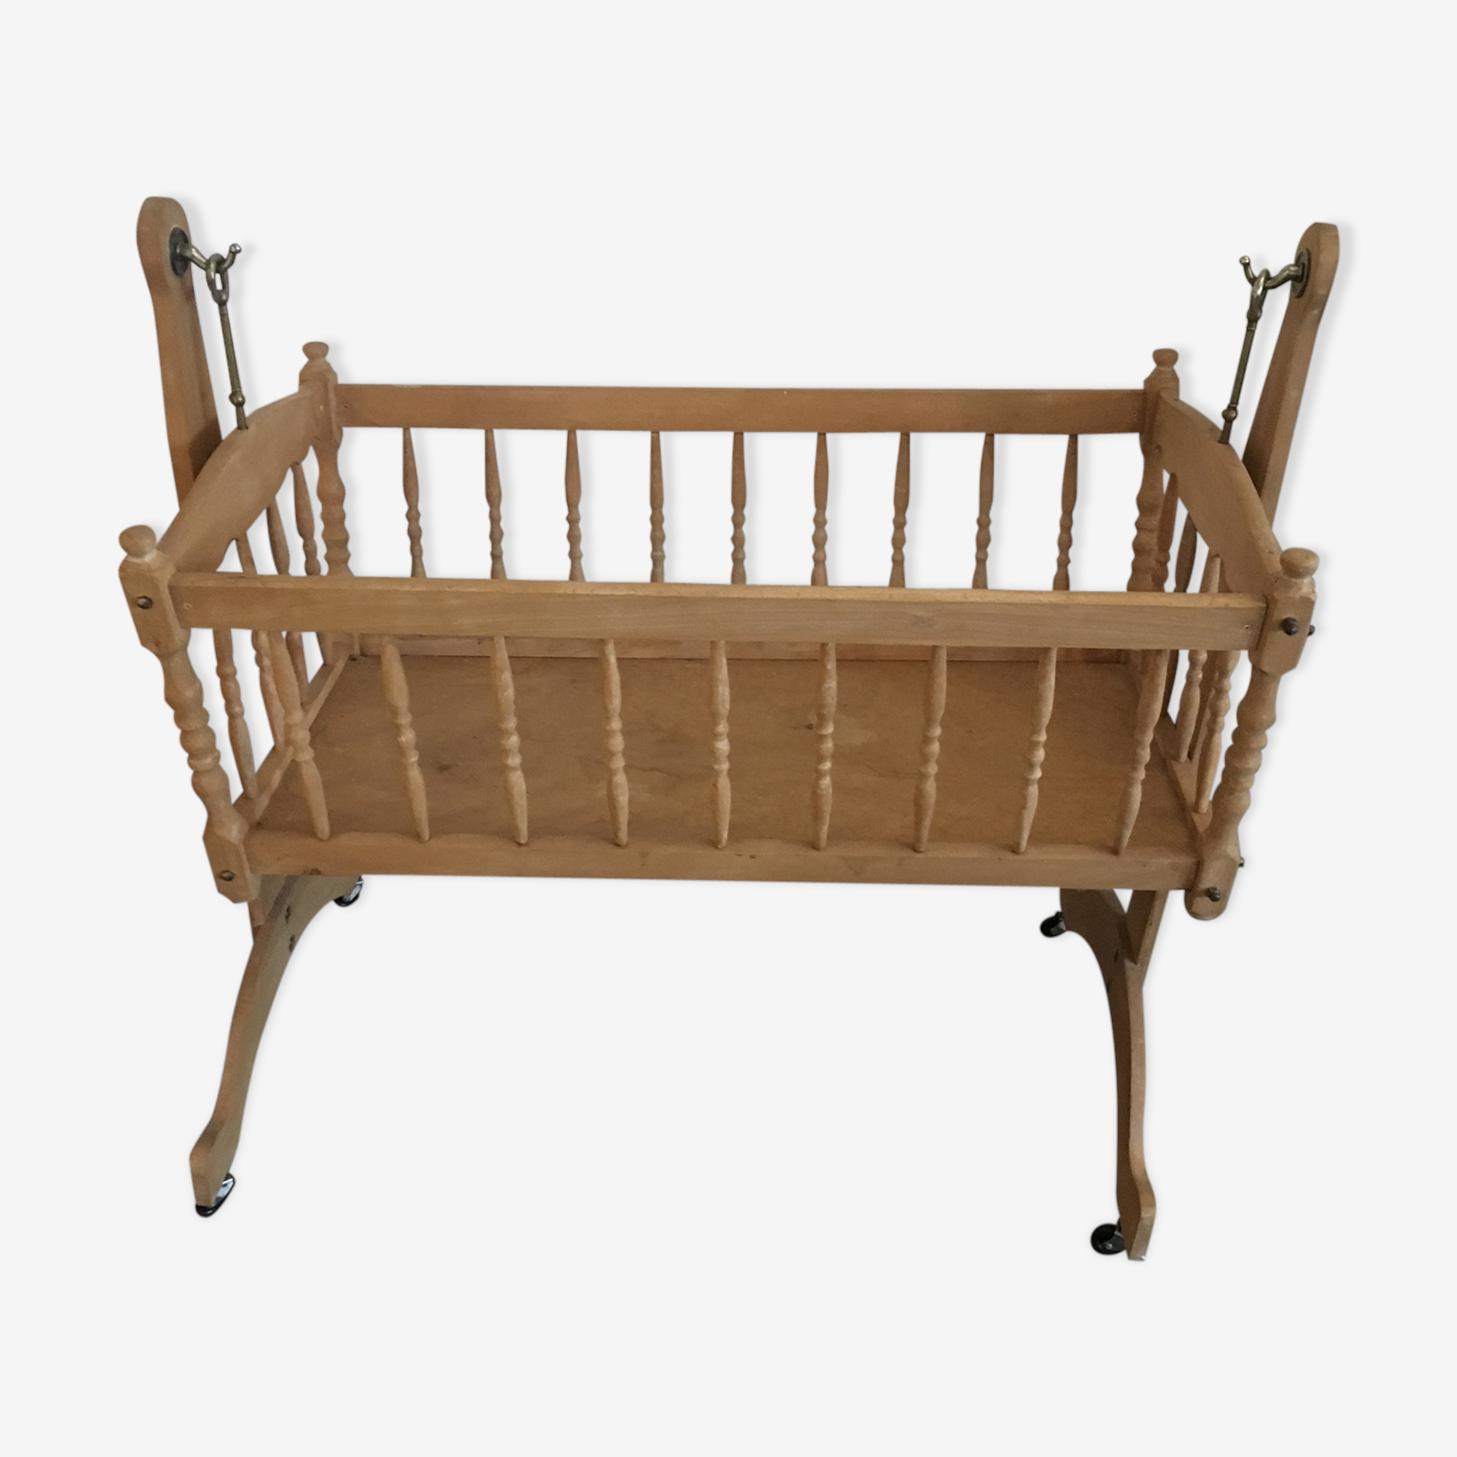 Cradle rocking wood